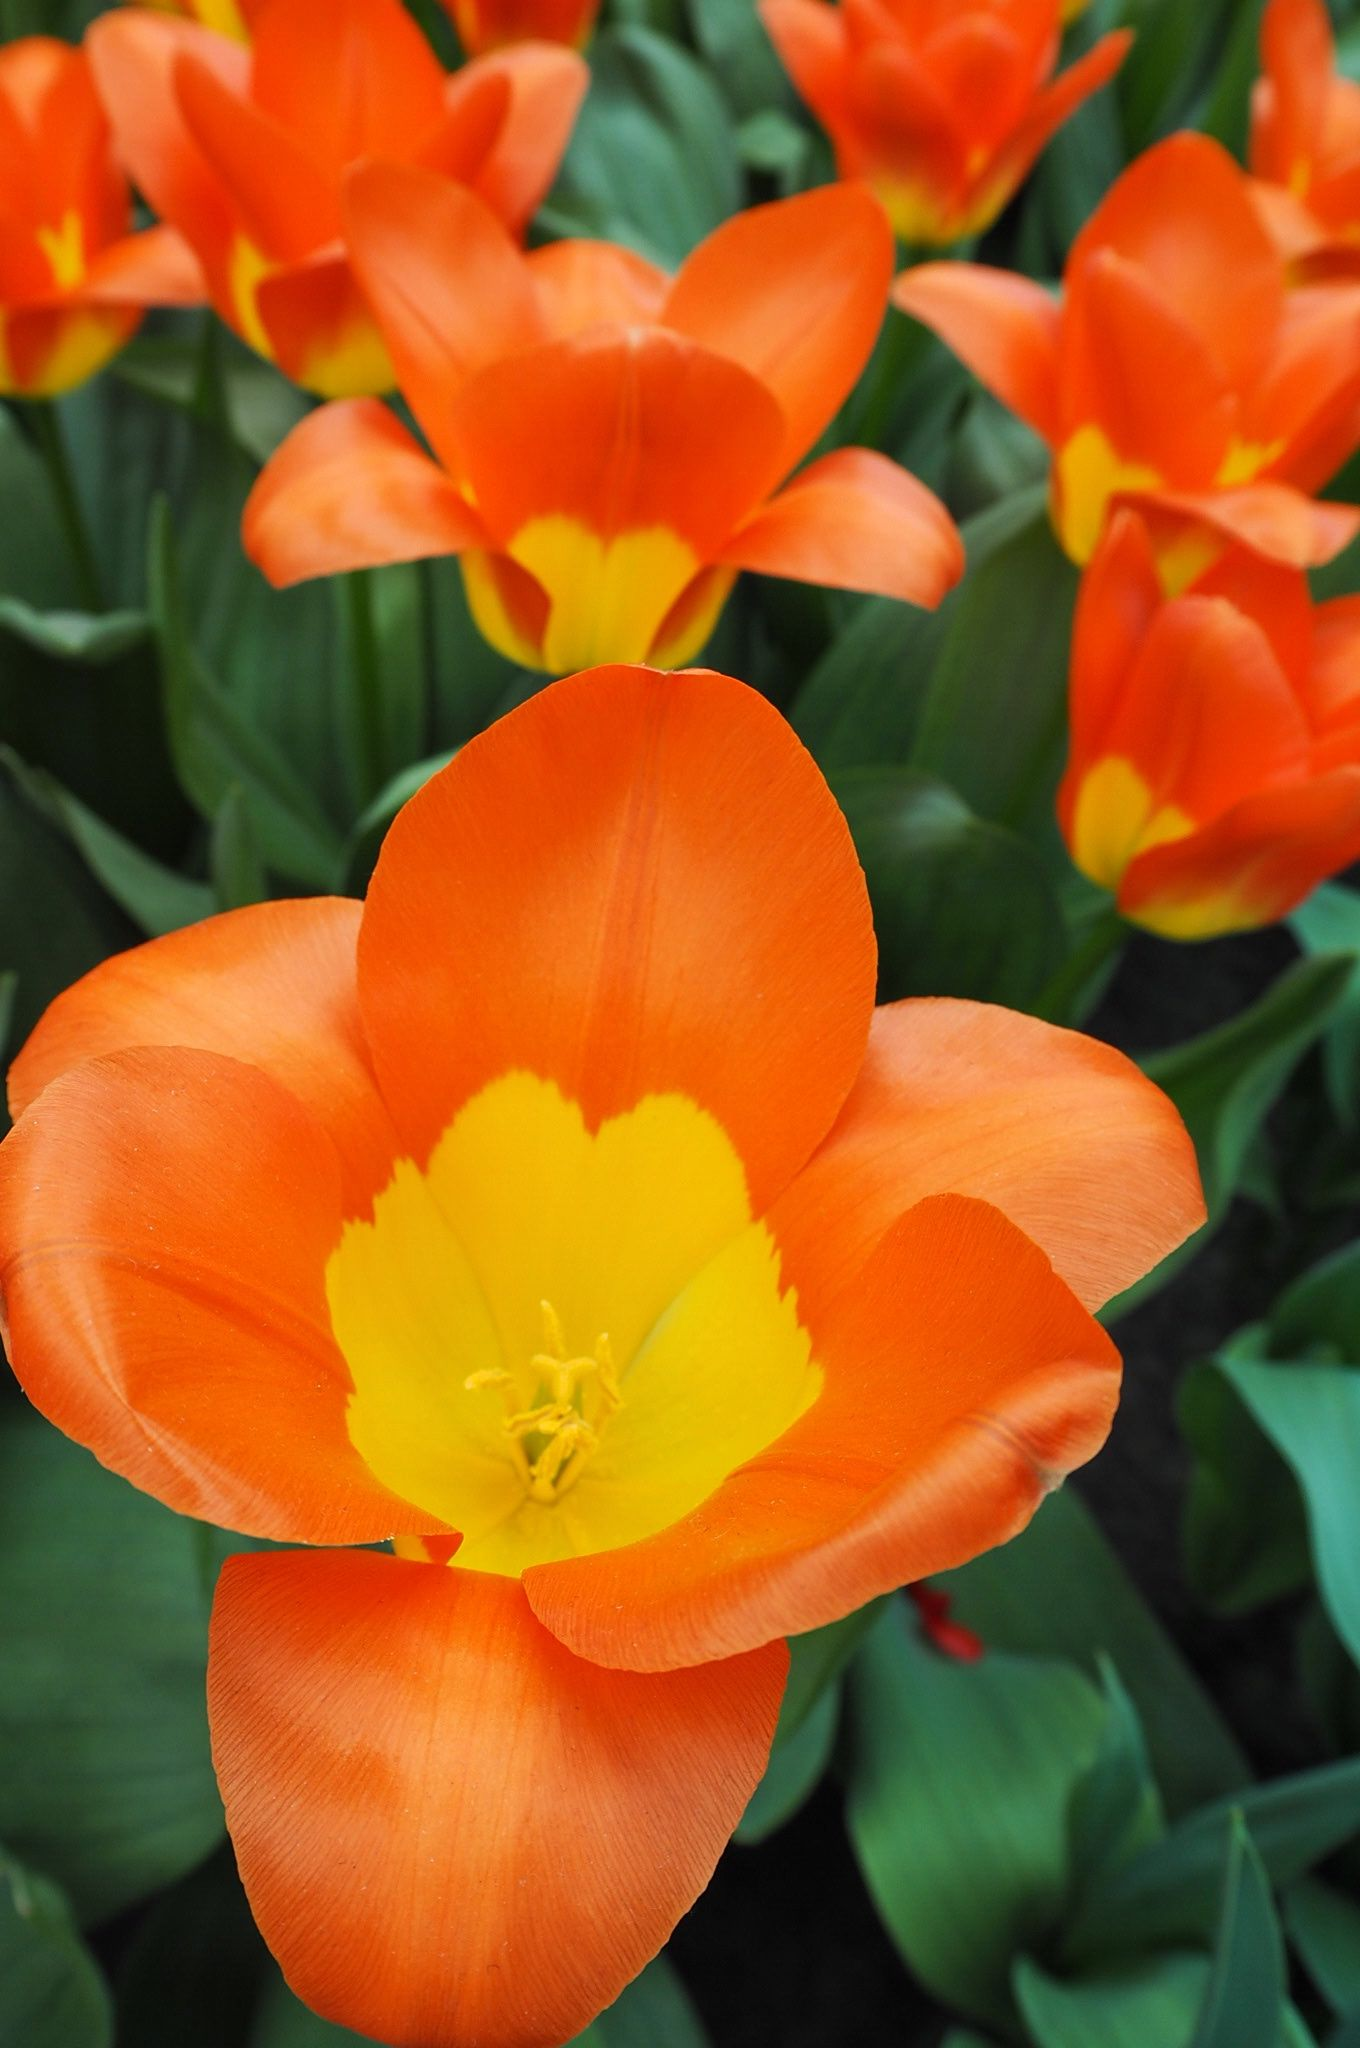 Orange Oracle Tulip Keukenhof Tulip Gardens